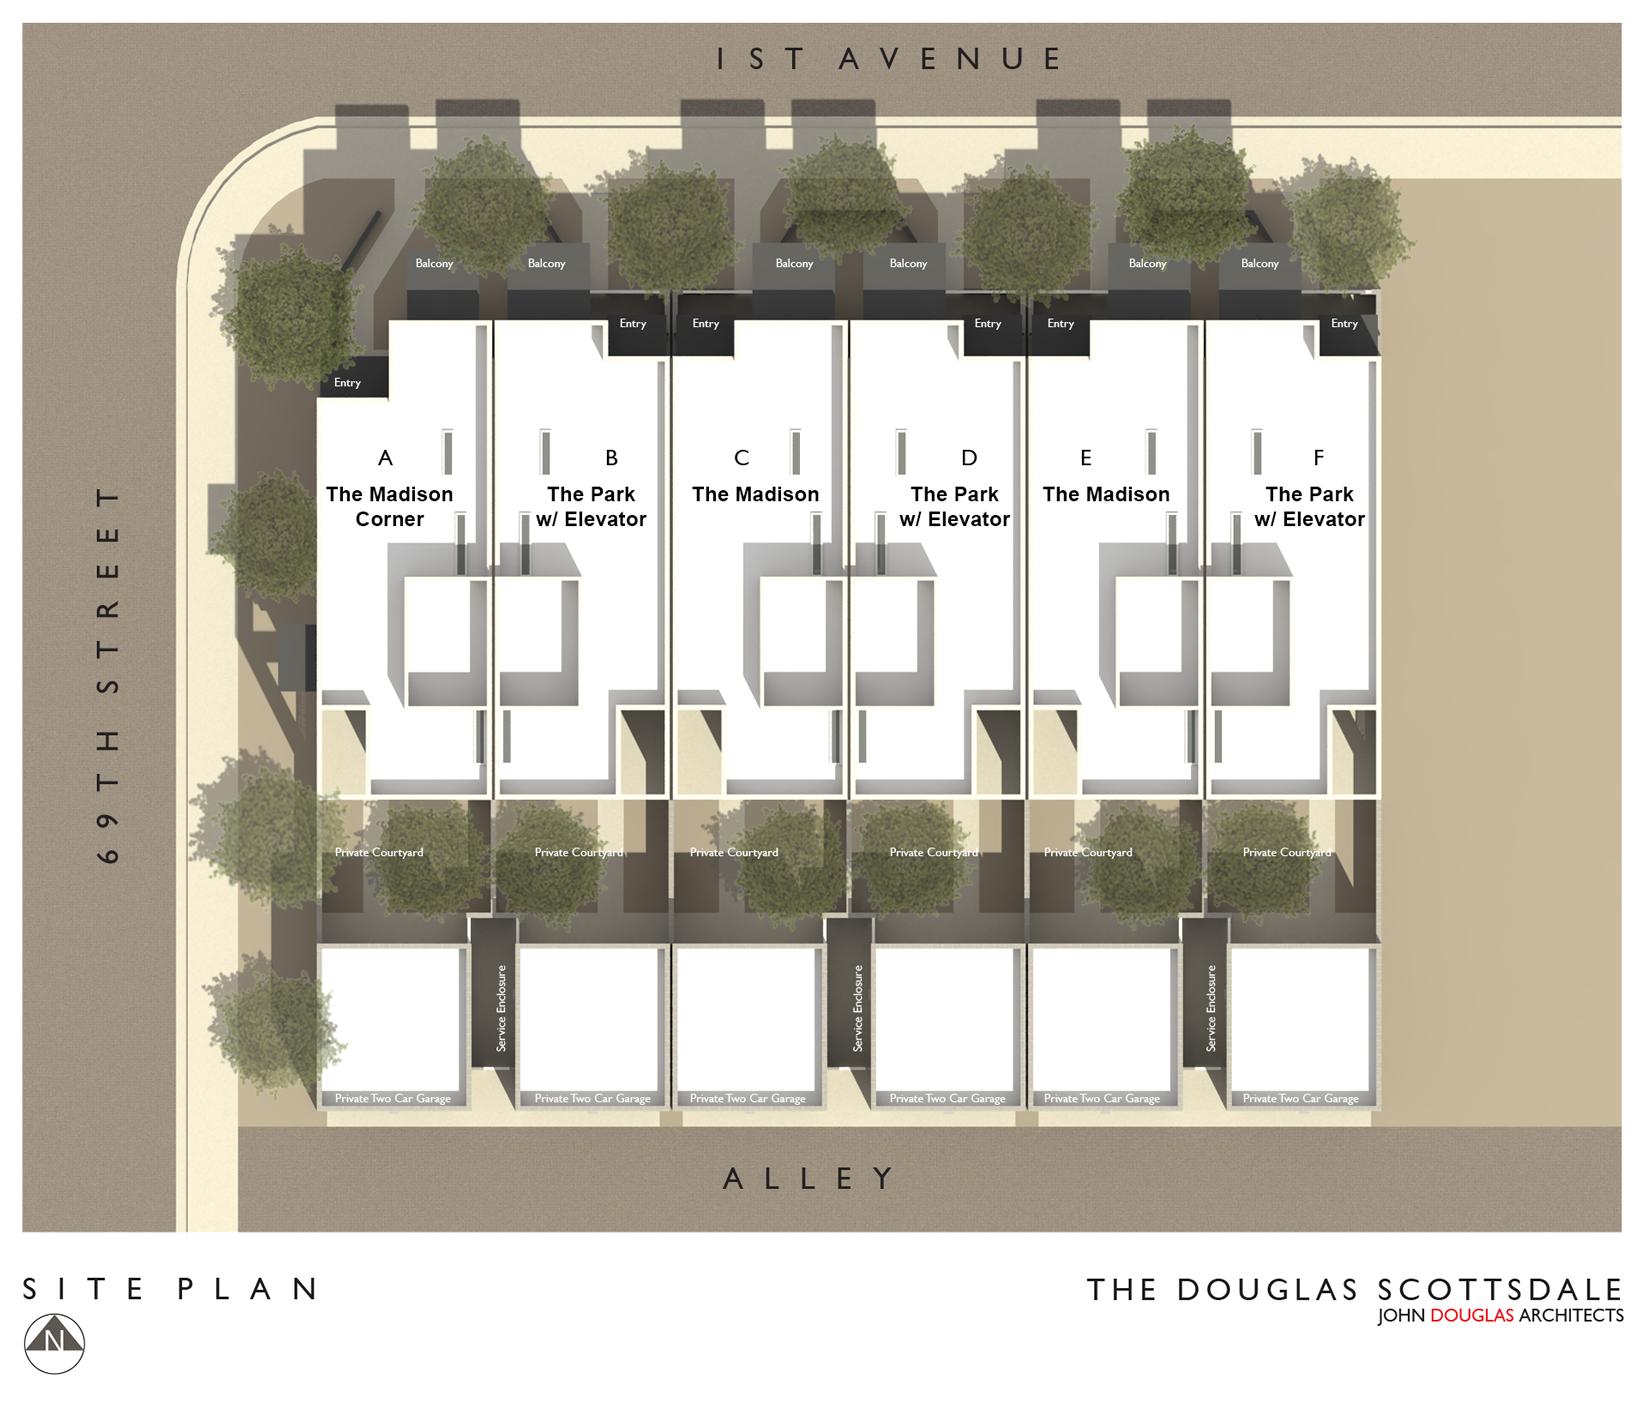 The douglas scottsdale site plan